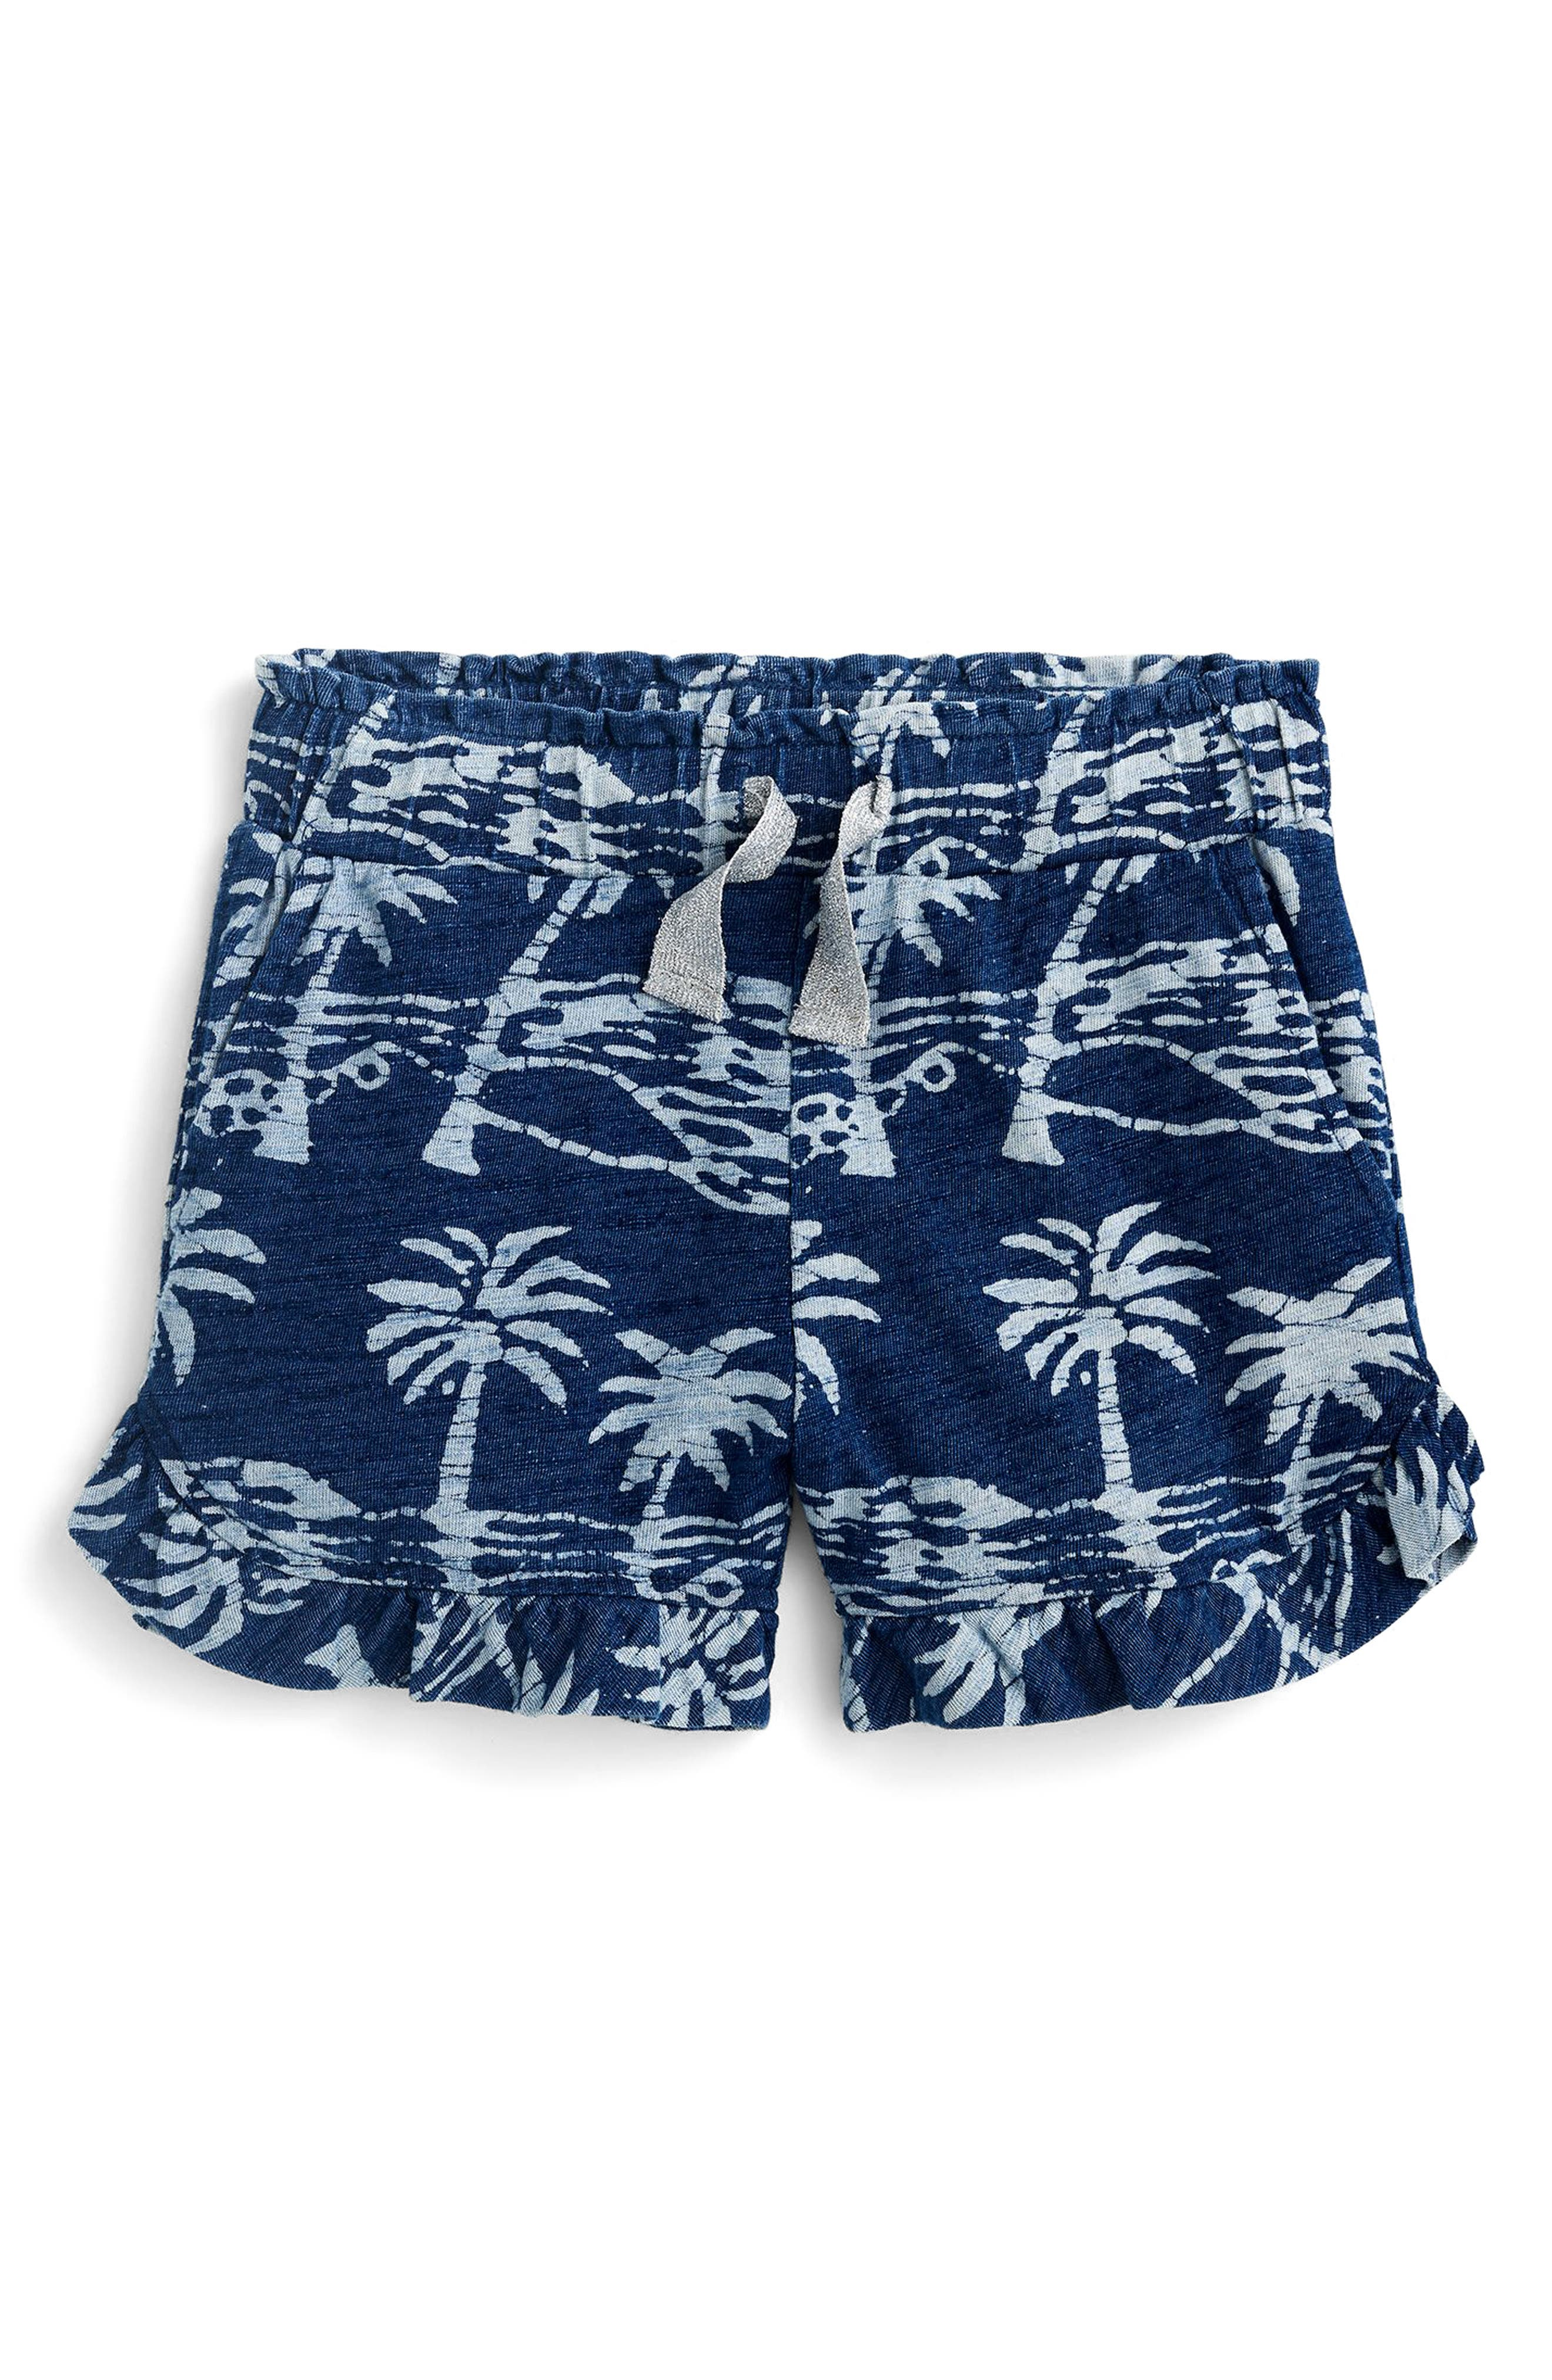 crewcuts by J. Crew Paulette Palm Print Ruffle Shorts (Toddler Girls, Little Girls & Big Girls)